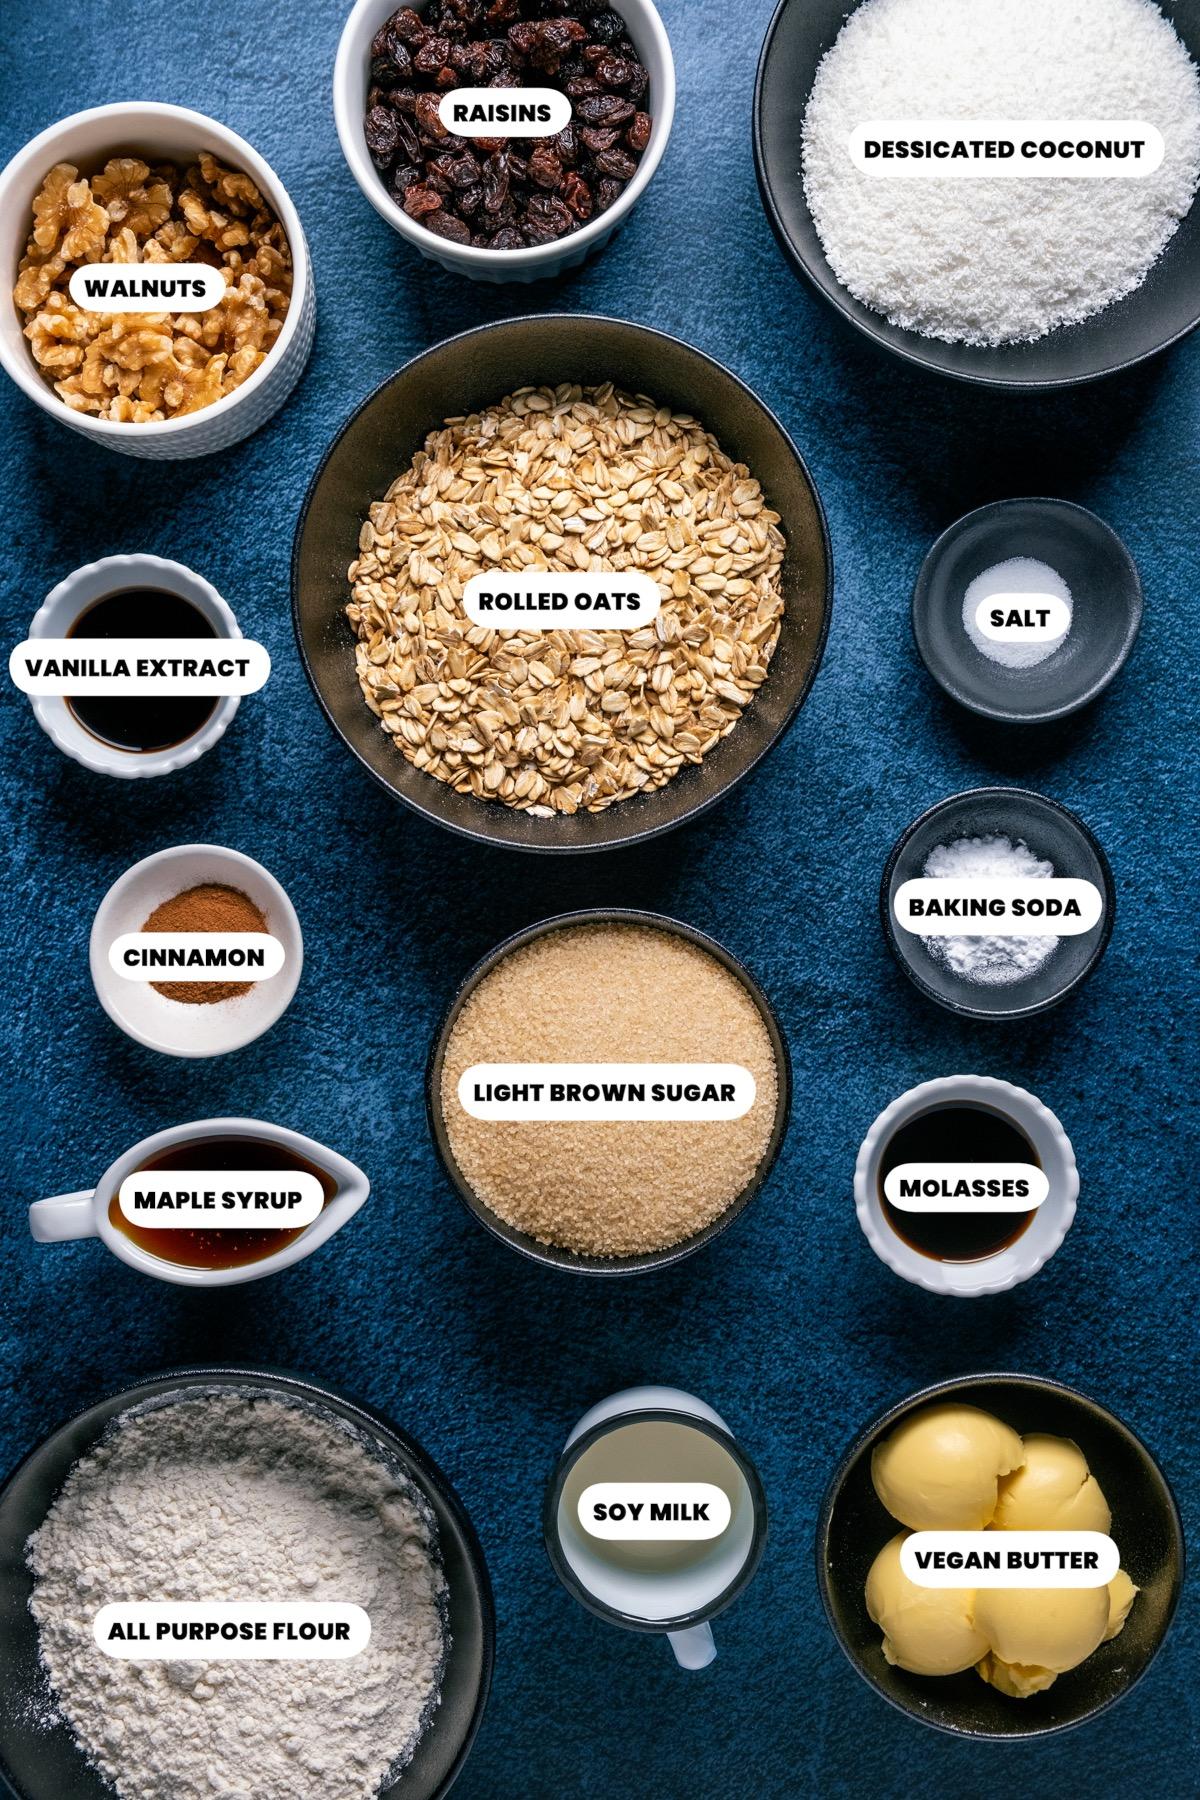 Photo of the ingredients needed to make vegan oatmeal raisin cookies.